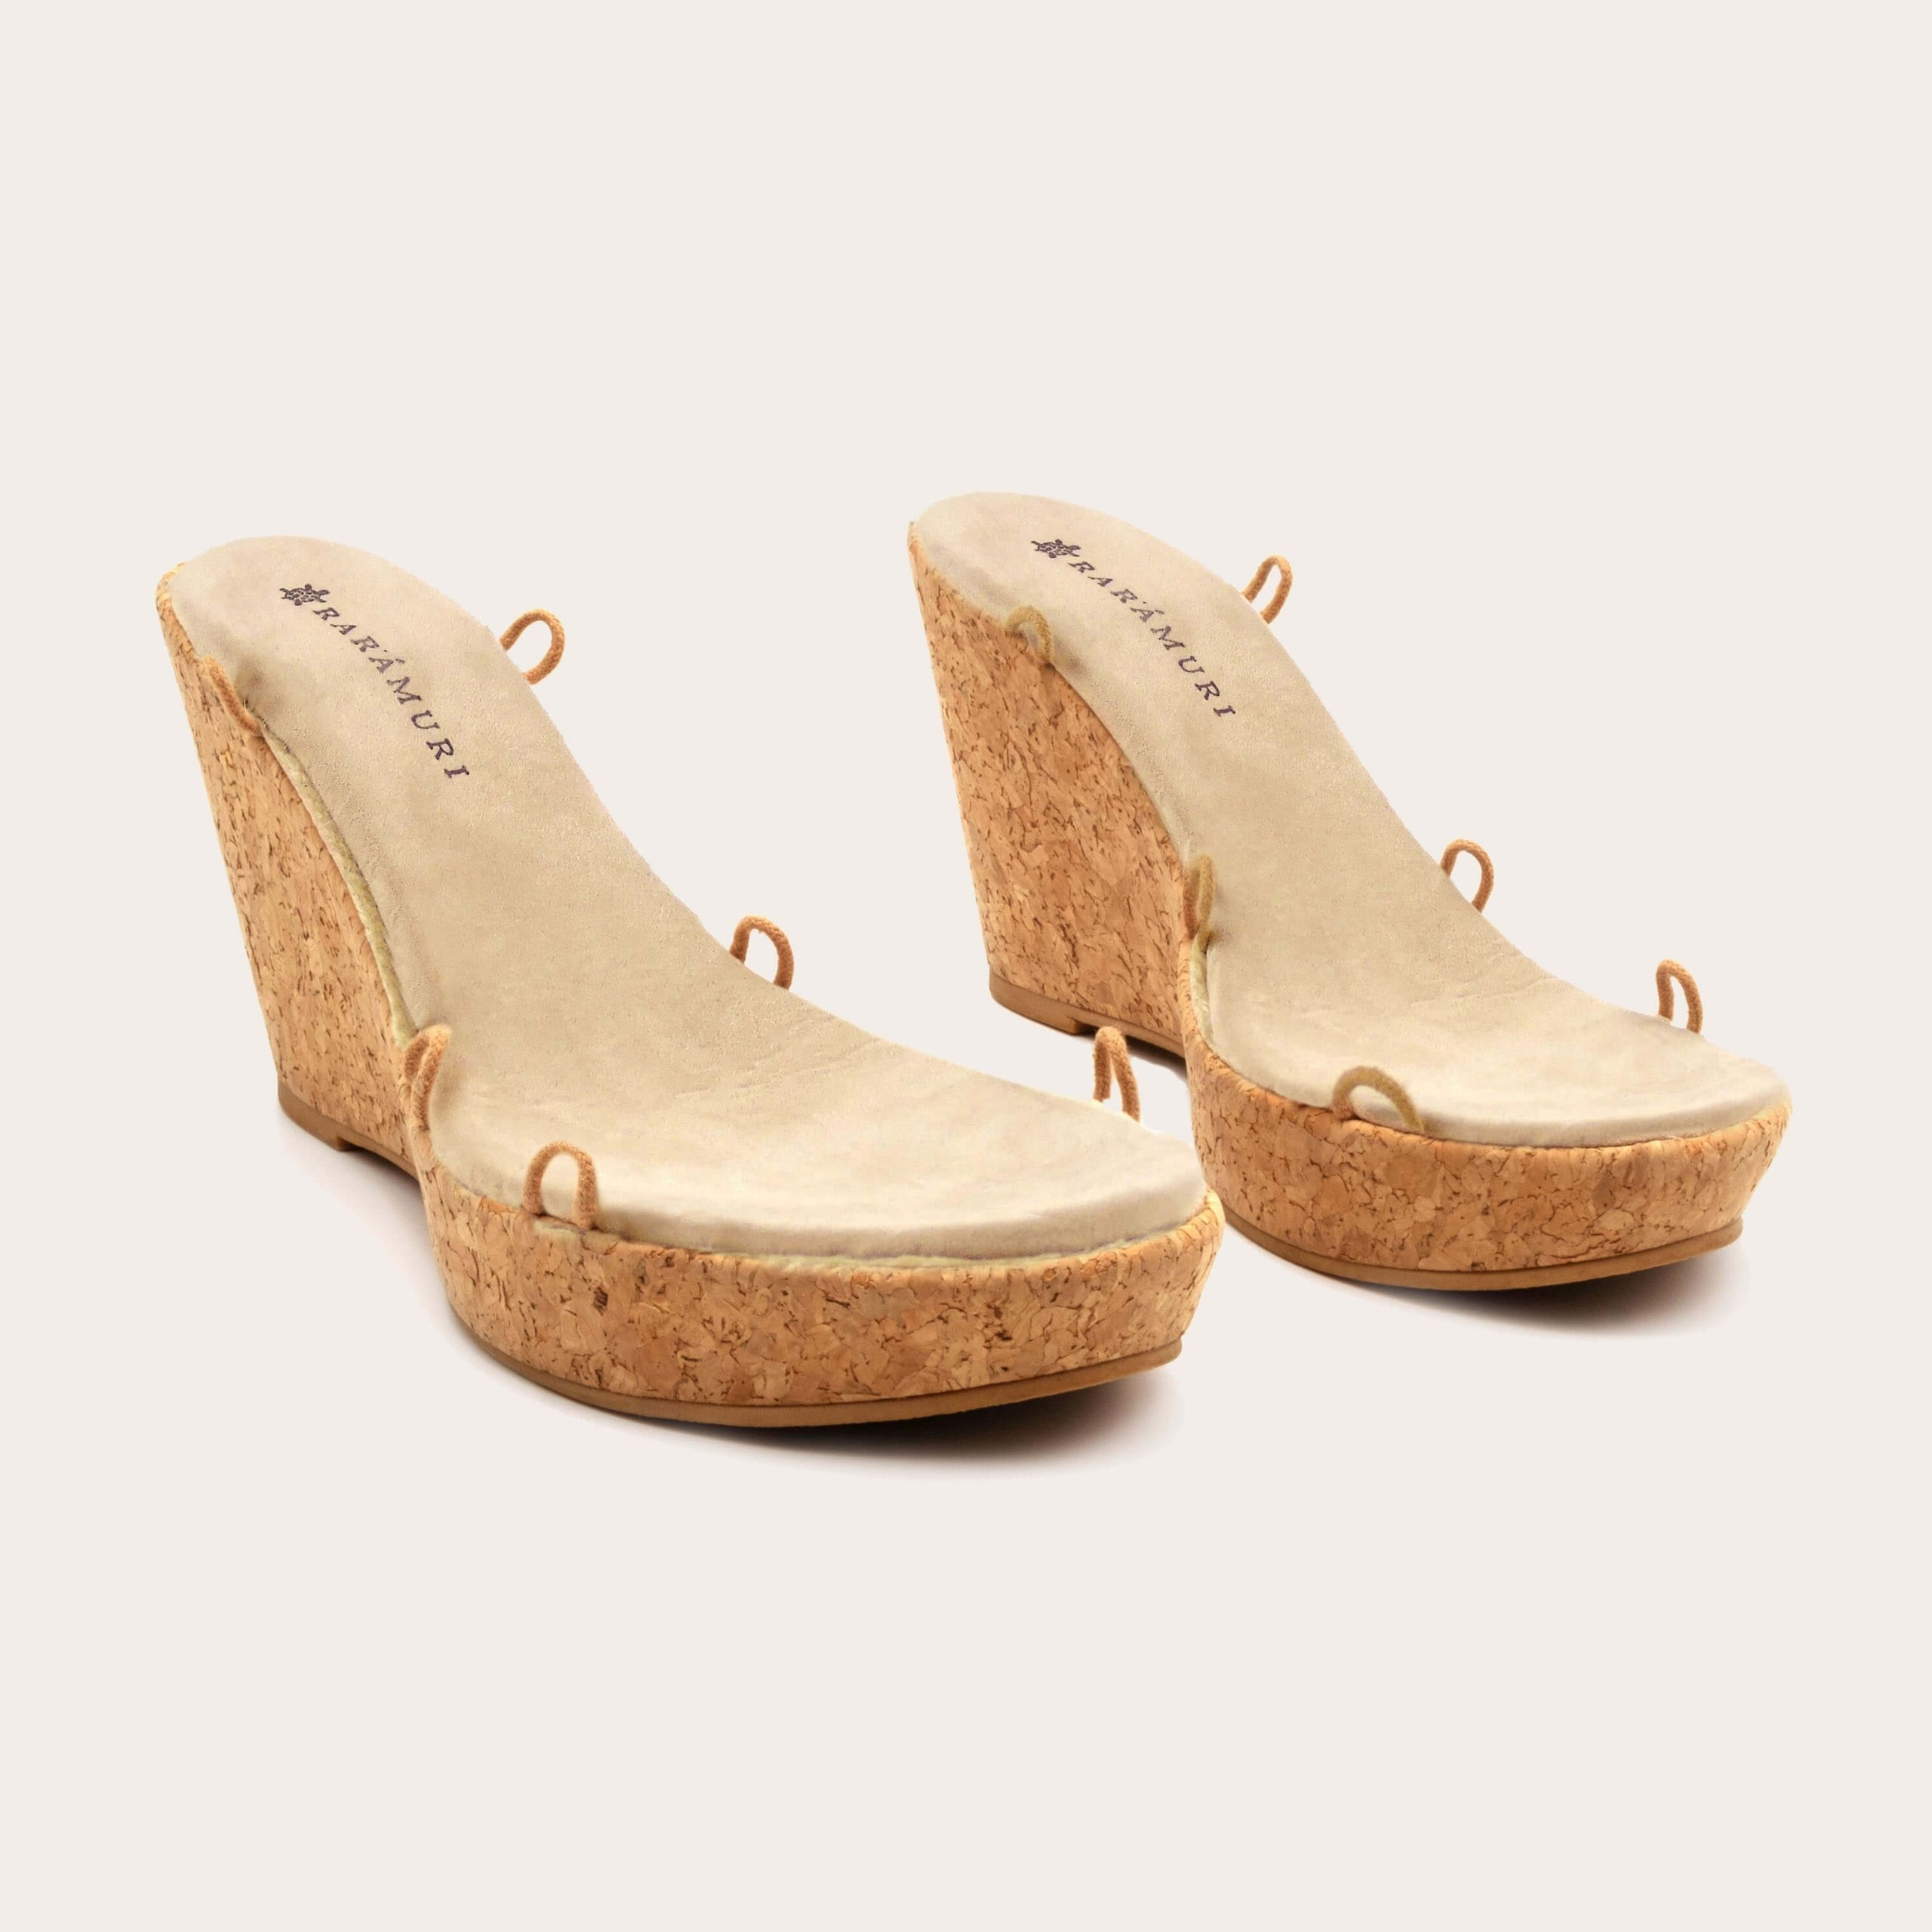 chilon-cork_2_lintsandalen sandals travelsandals vegan sustainable sandals wikkelsandalen